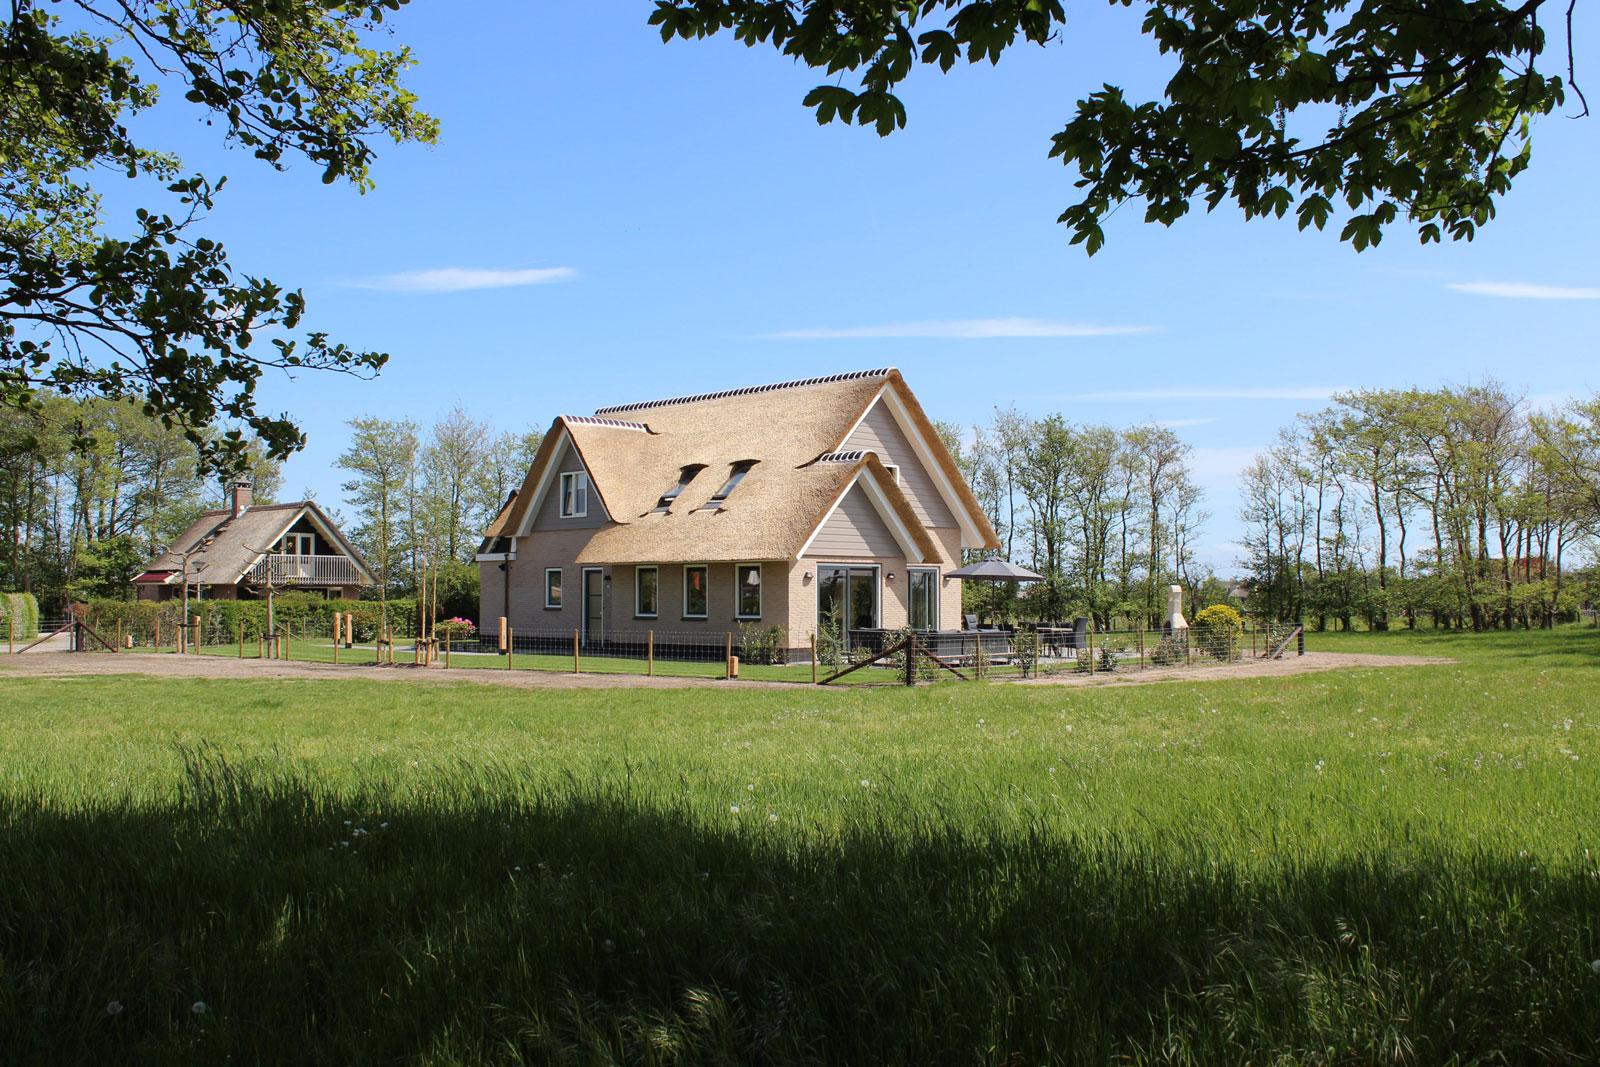 6-8 Persoons Wellness Landhuis Rietgedekt (150 m2)